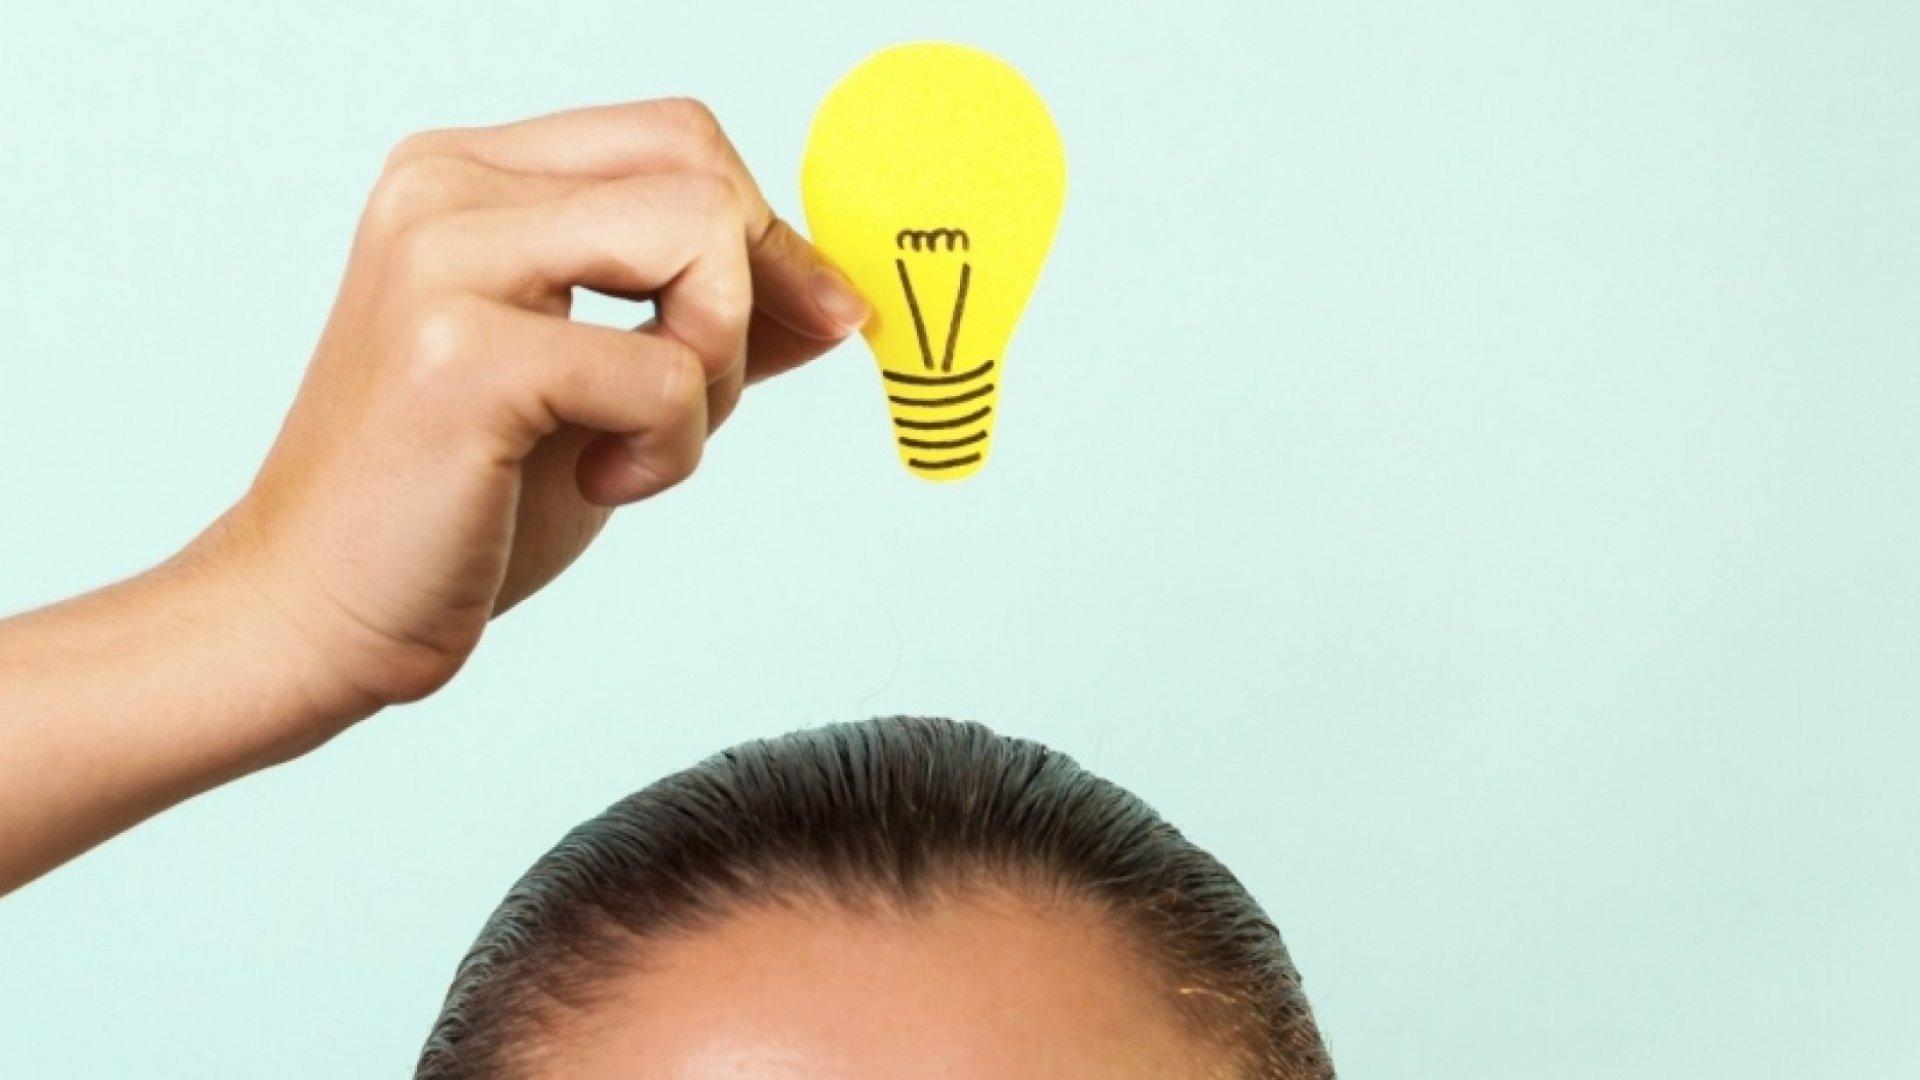 5 Ways to Inspire Your Next Idea